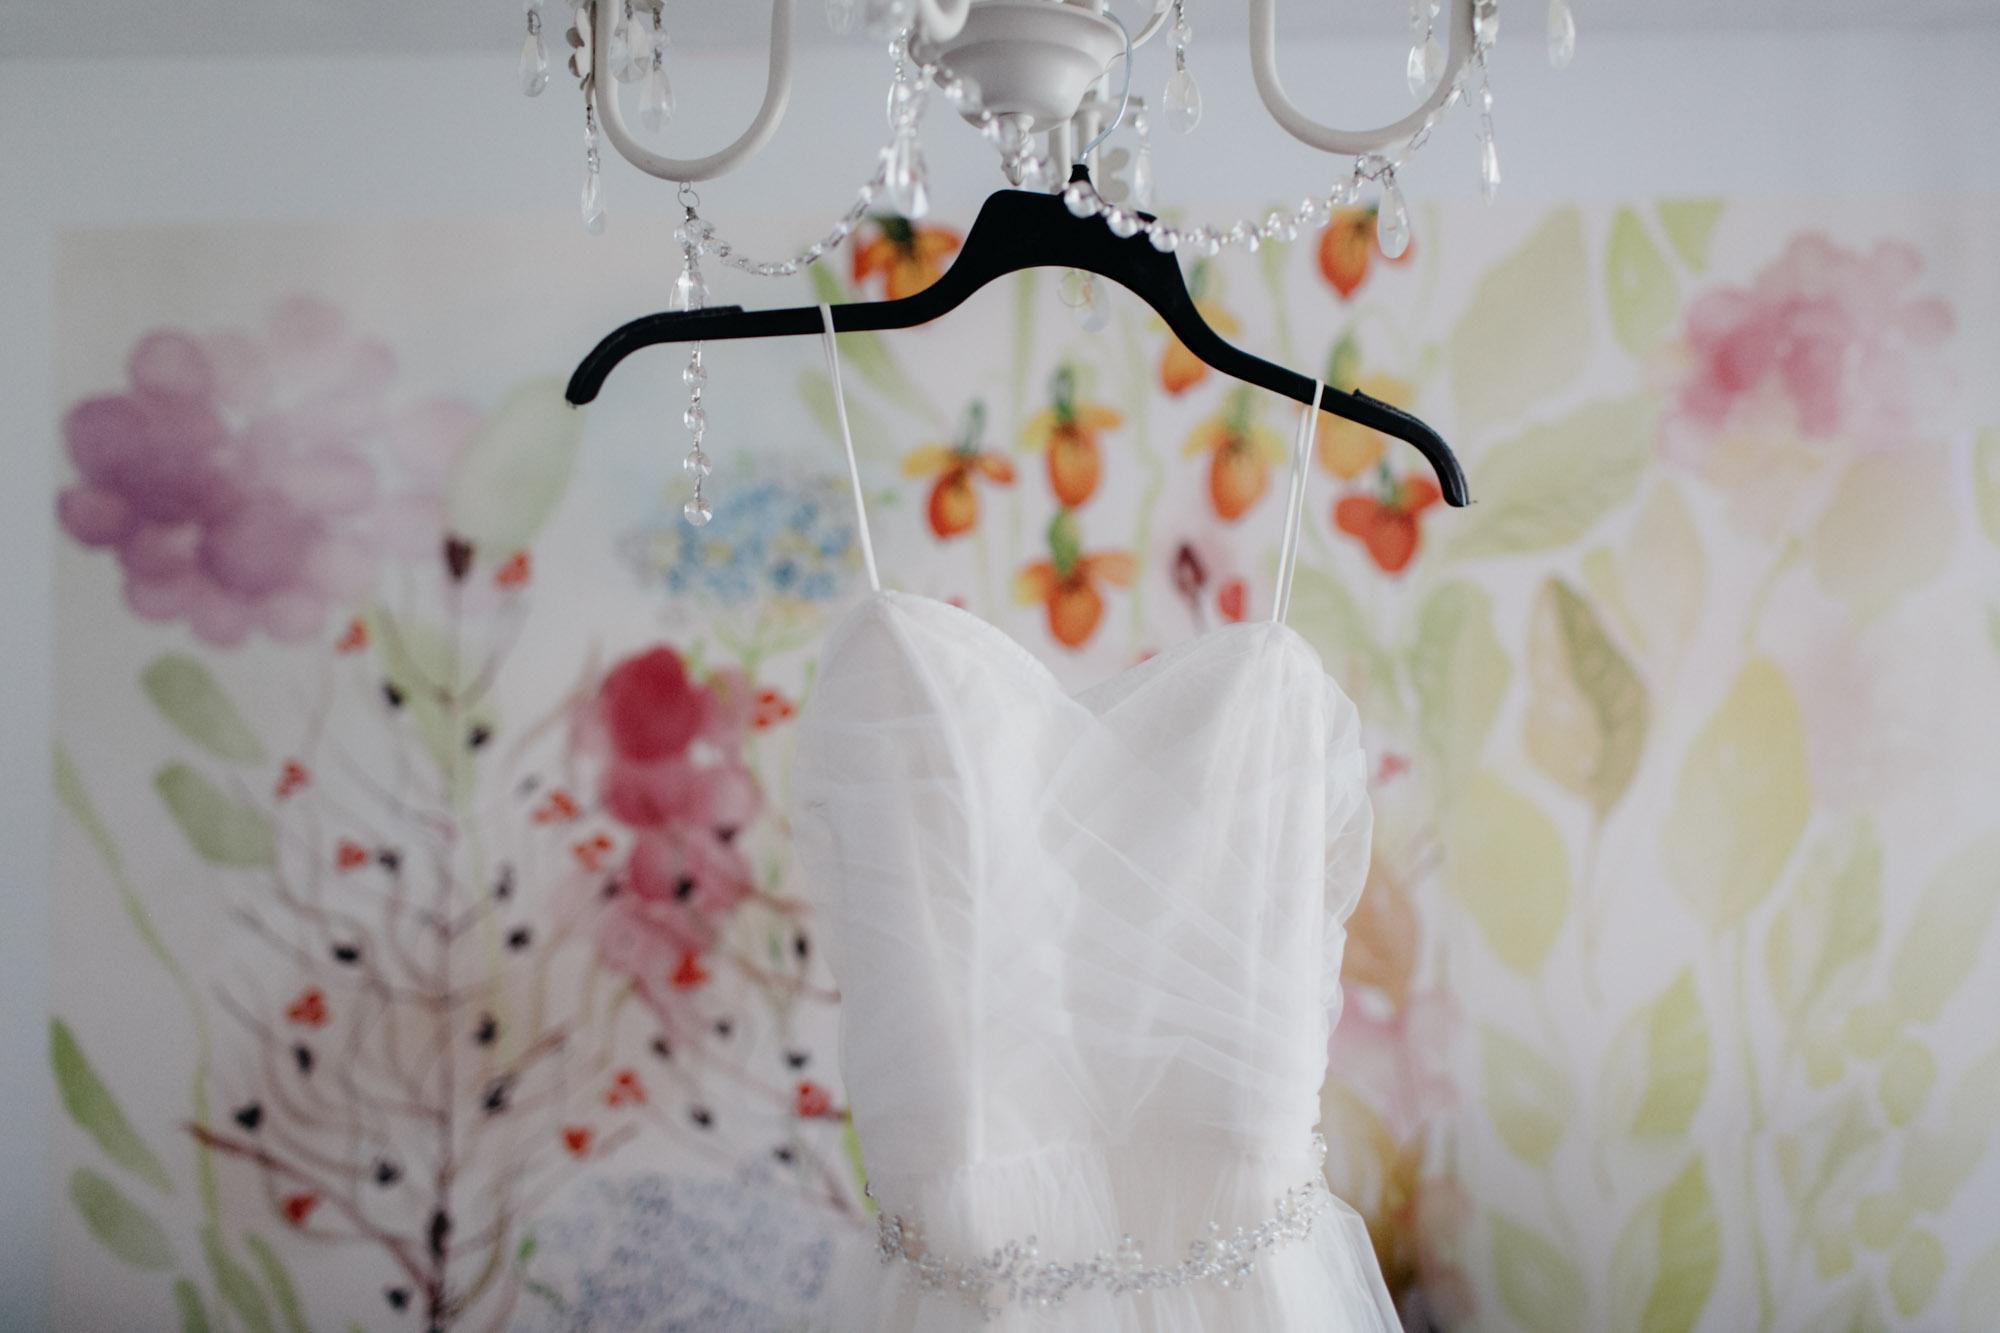 omaha-wedding-photographer-meghan-time-2.jpg